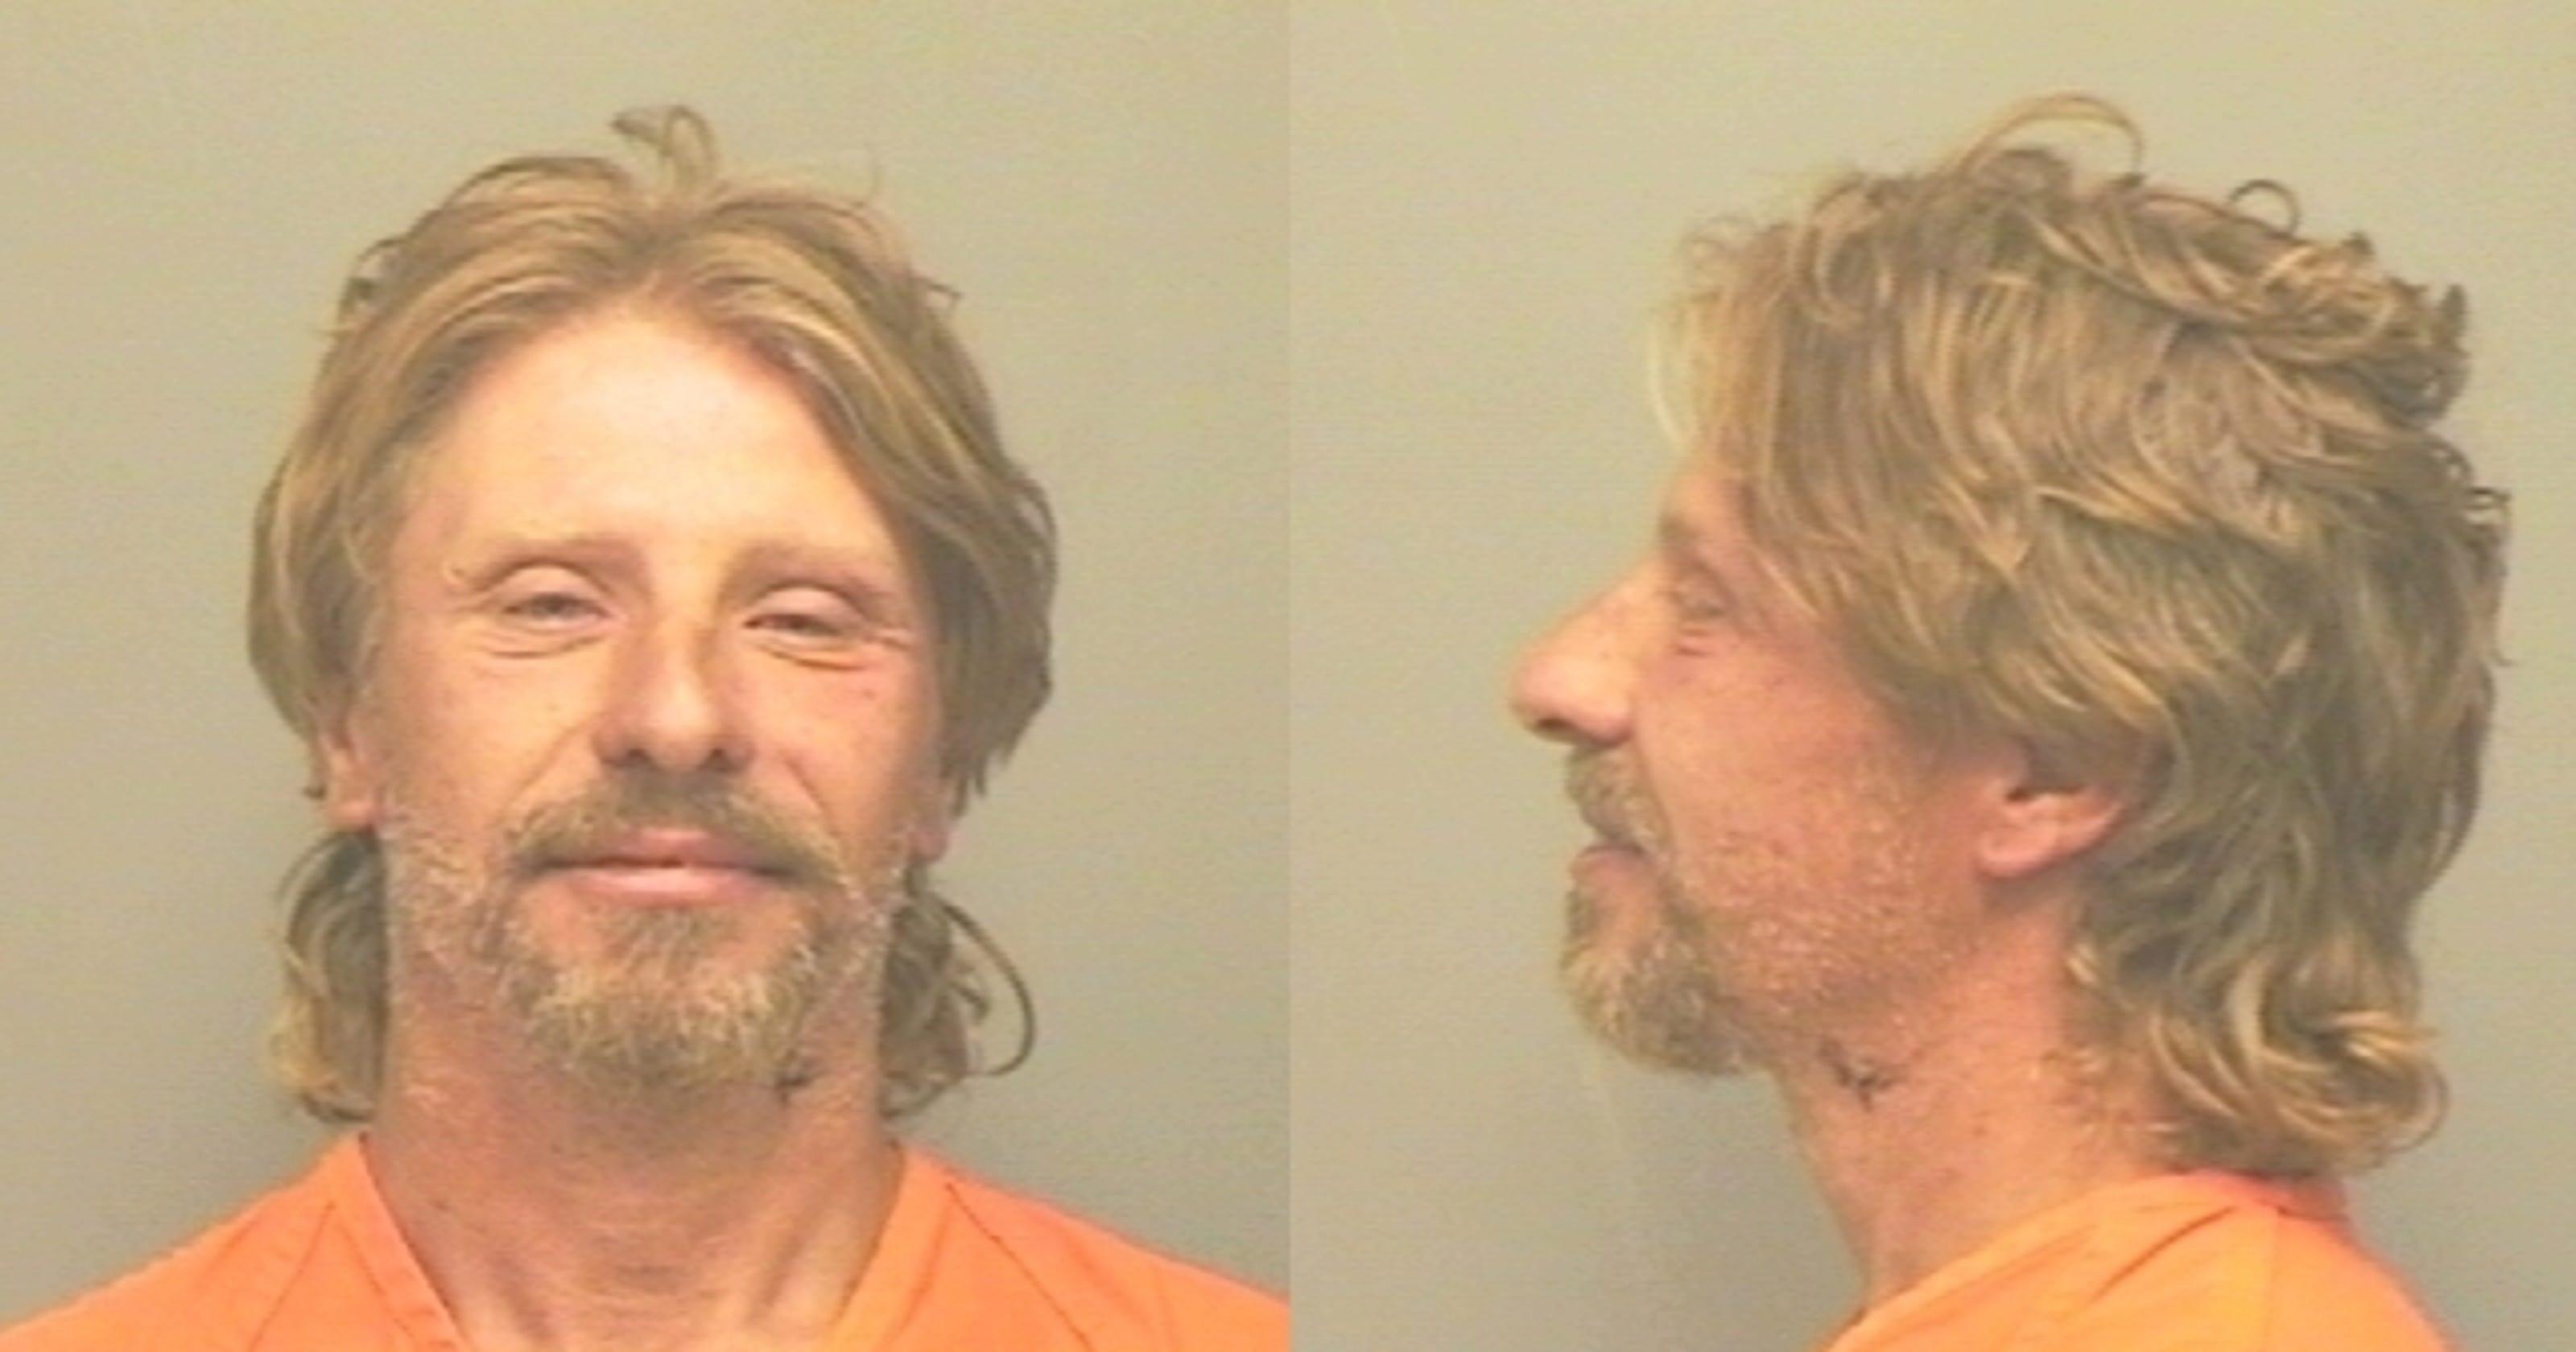 Warrants: Panhandler threatens cops, shows penis to jail staff